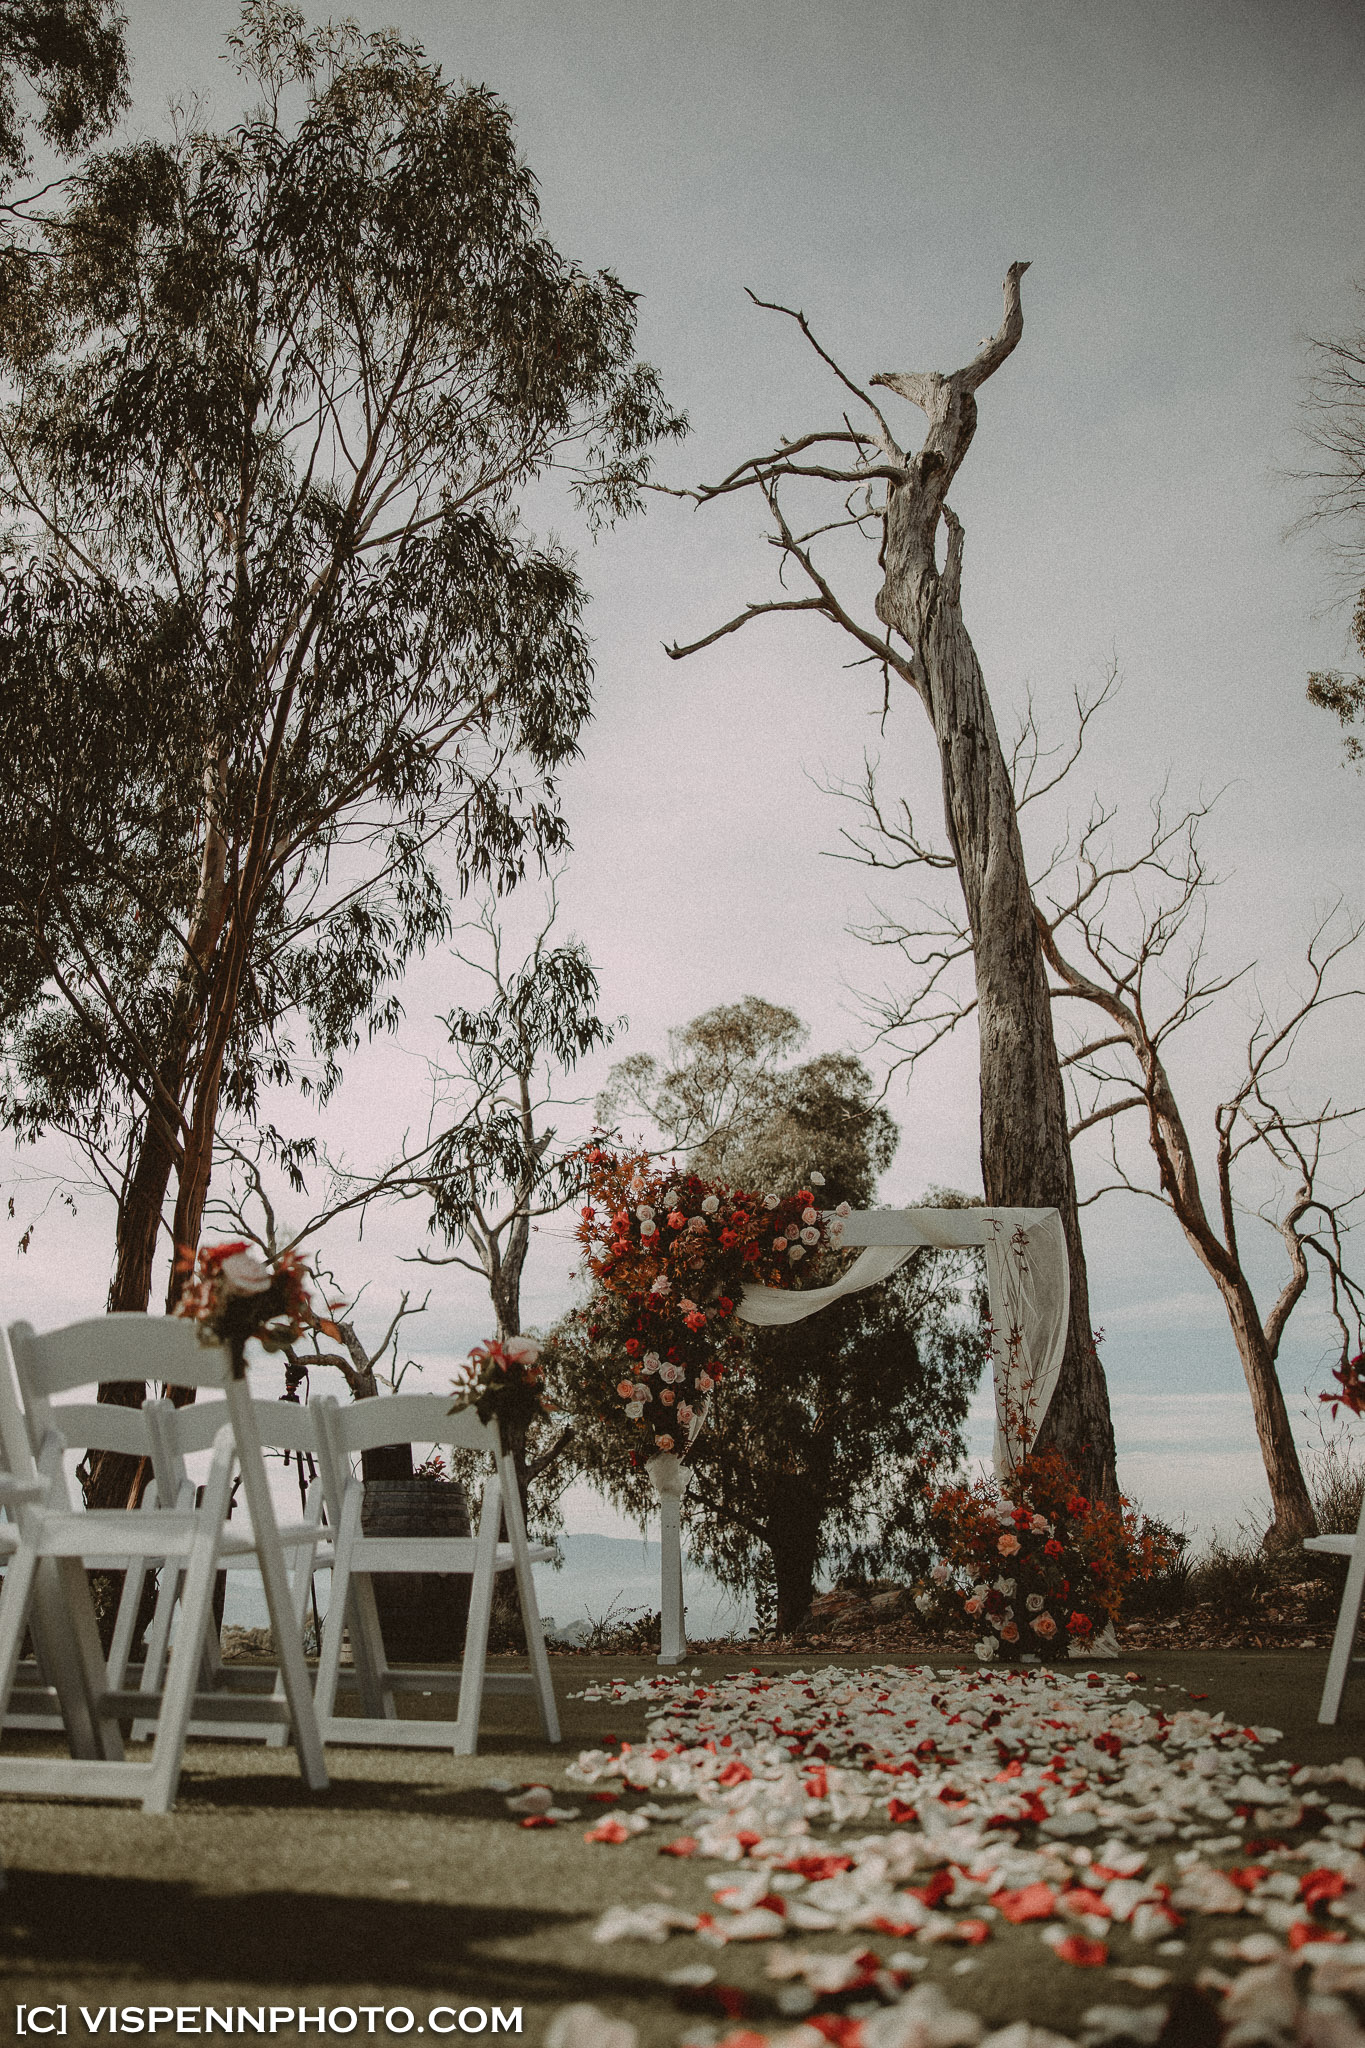 WEDDING DAY Photography Melbourne VISPENN 墨尔本 婚礼跟拍 婚礼摄像 婚礼摄影 结婚照 登记照 DominicHelen 1P 2652 EOSR VISPENN